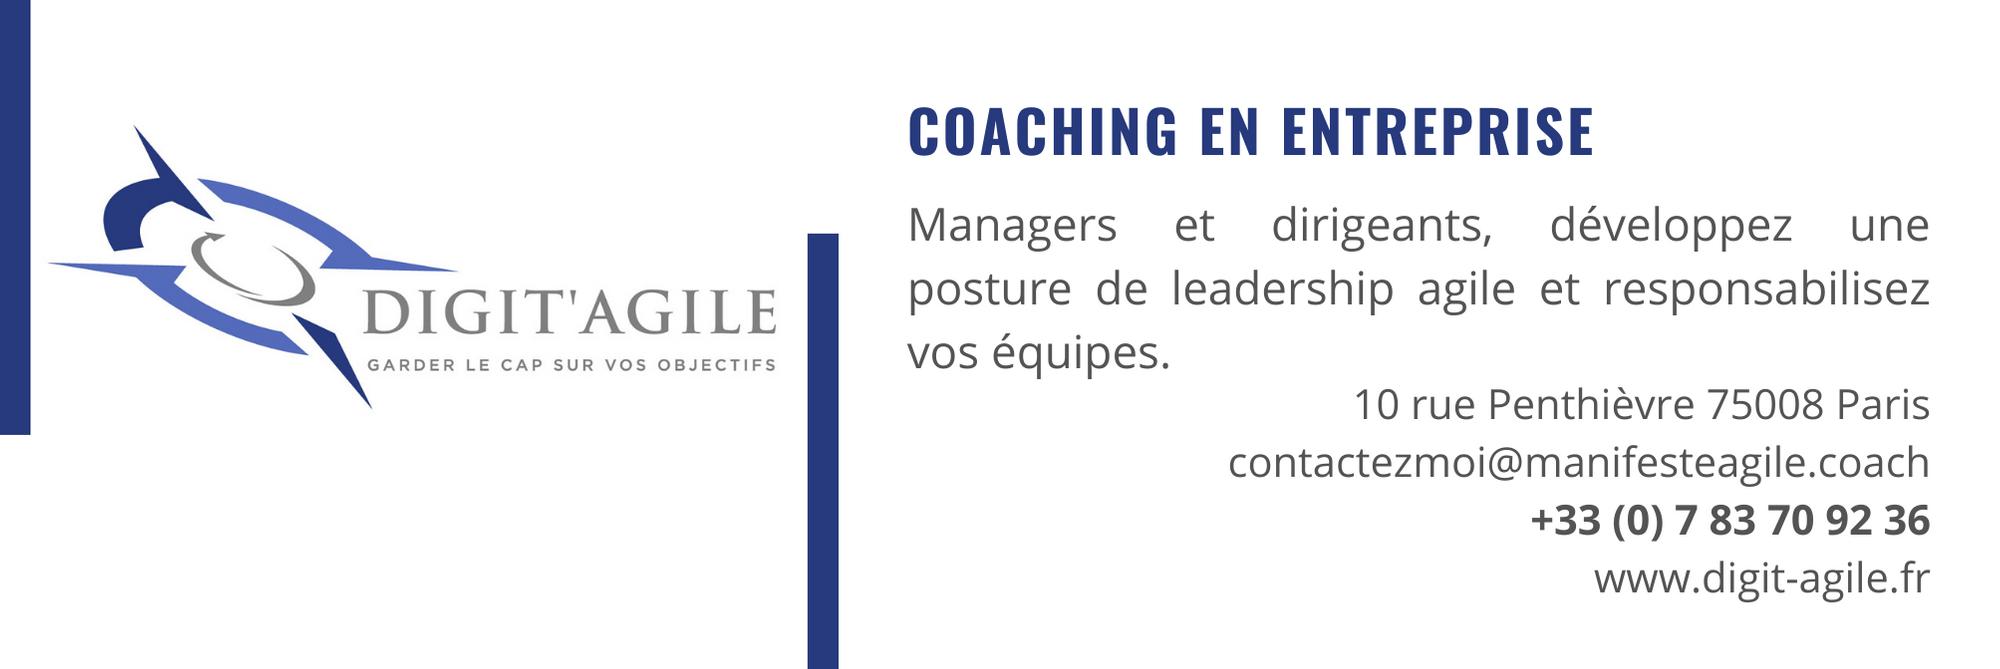 Coaching de Managers et Dirigeants